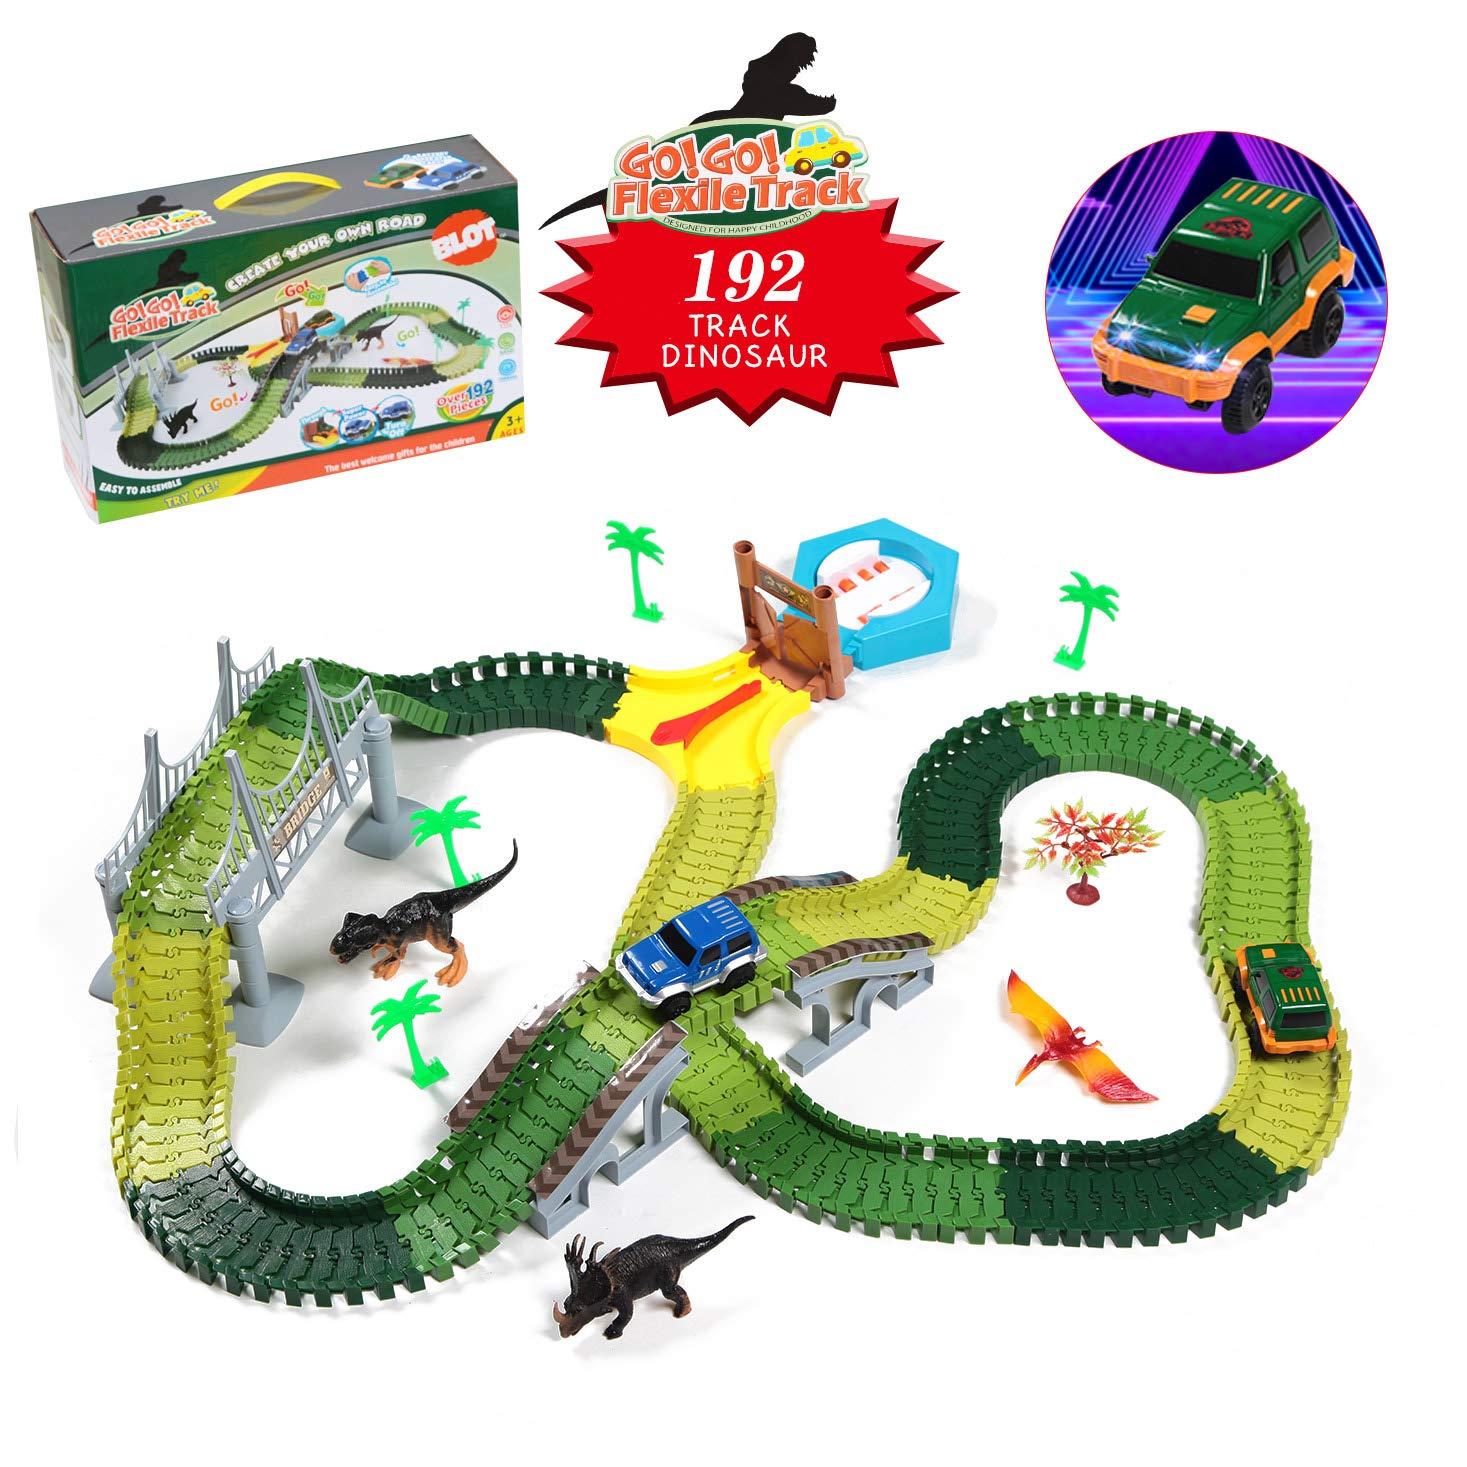 Dinosaur Race Track Toys 192PCS Car Flexible Tracks Playset with Dinosaurs Vehicle Educational Toys Boys Gift for 3 4 5 6 Years Old Kids Birthday Christmas